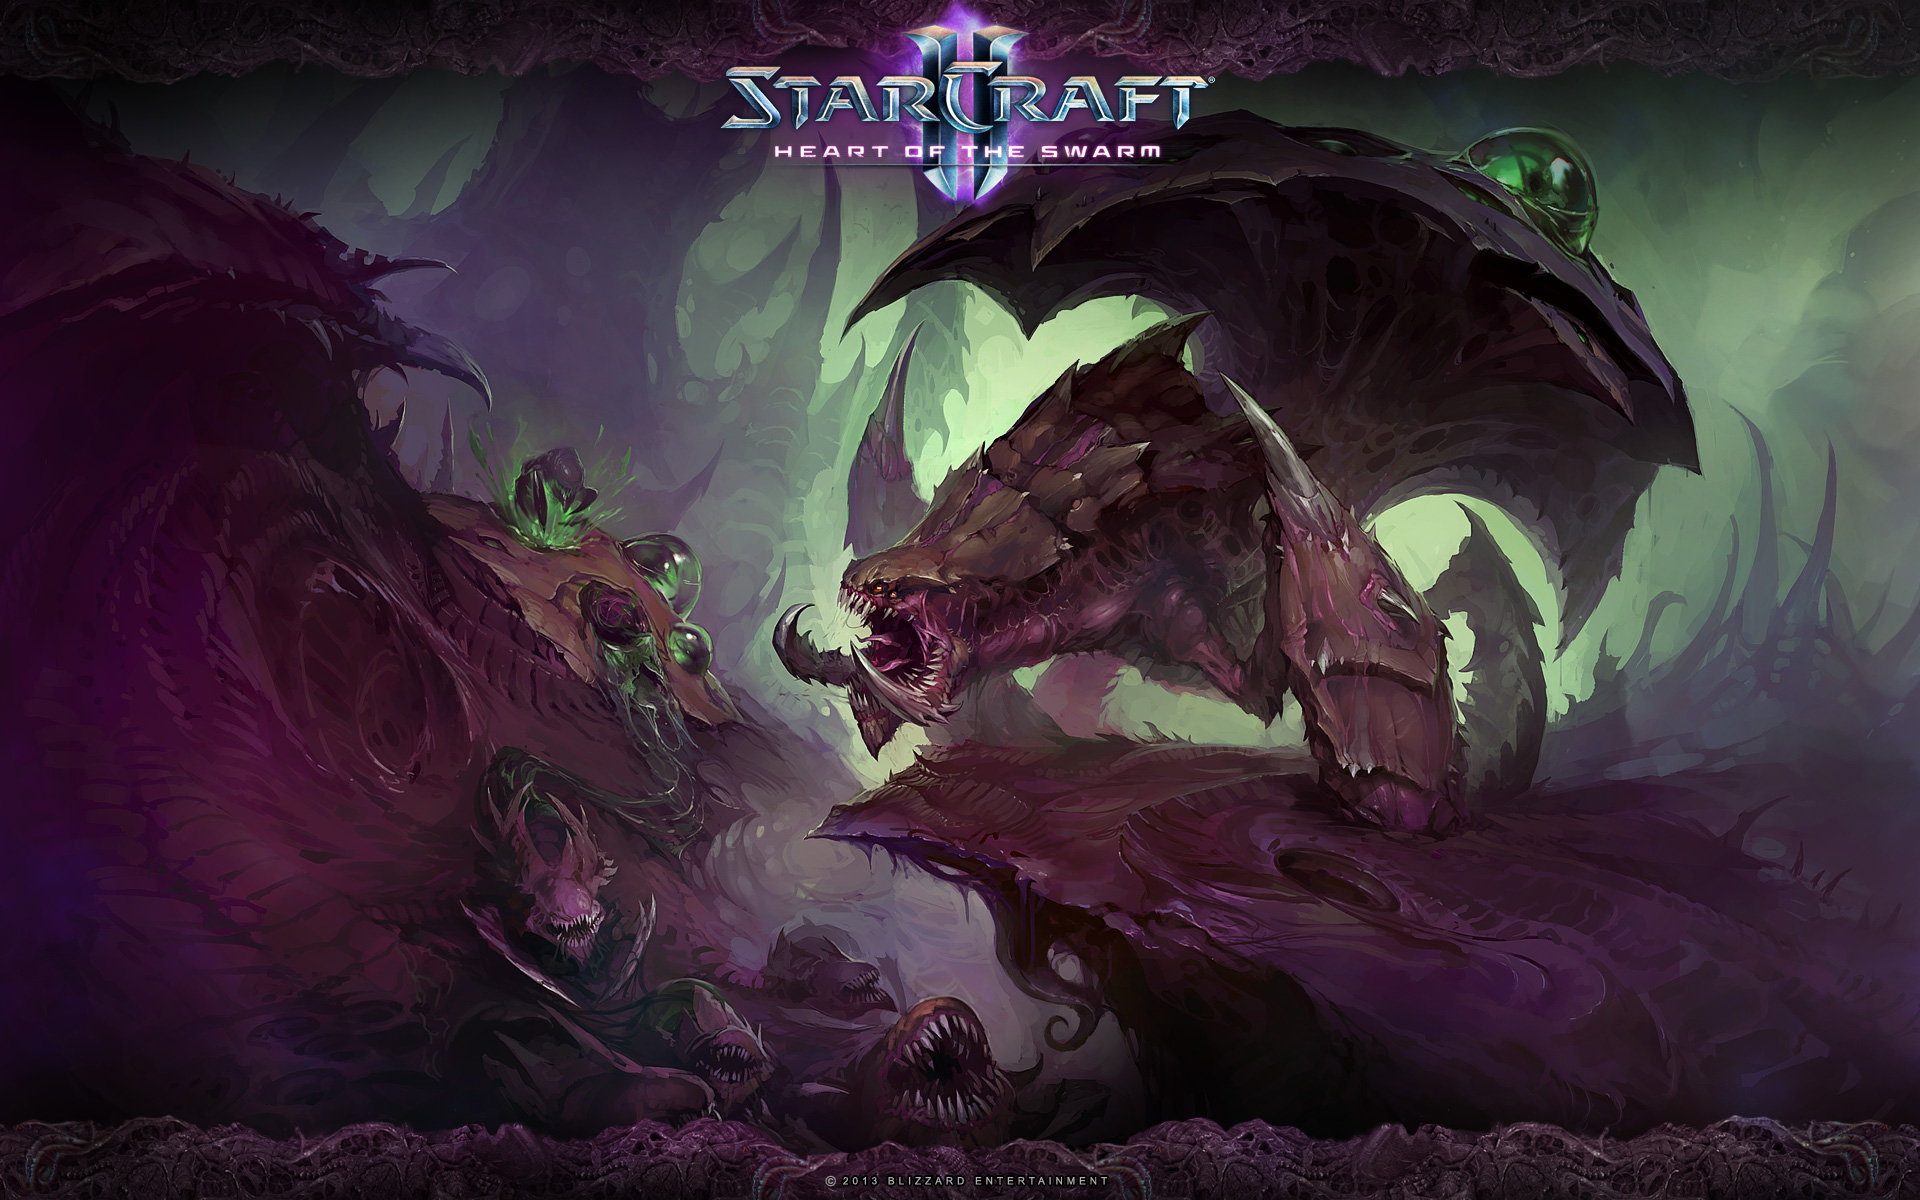 StarCraft 2 zerg concept art picture Зерги улей